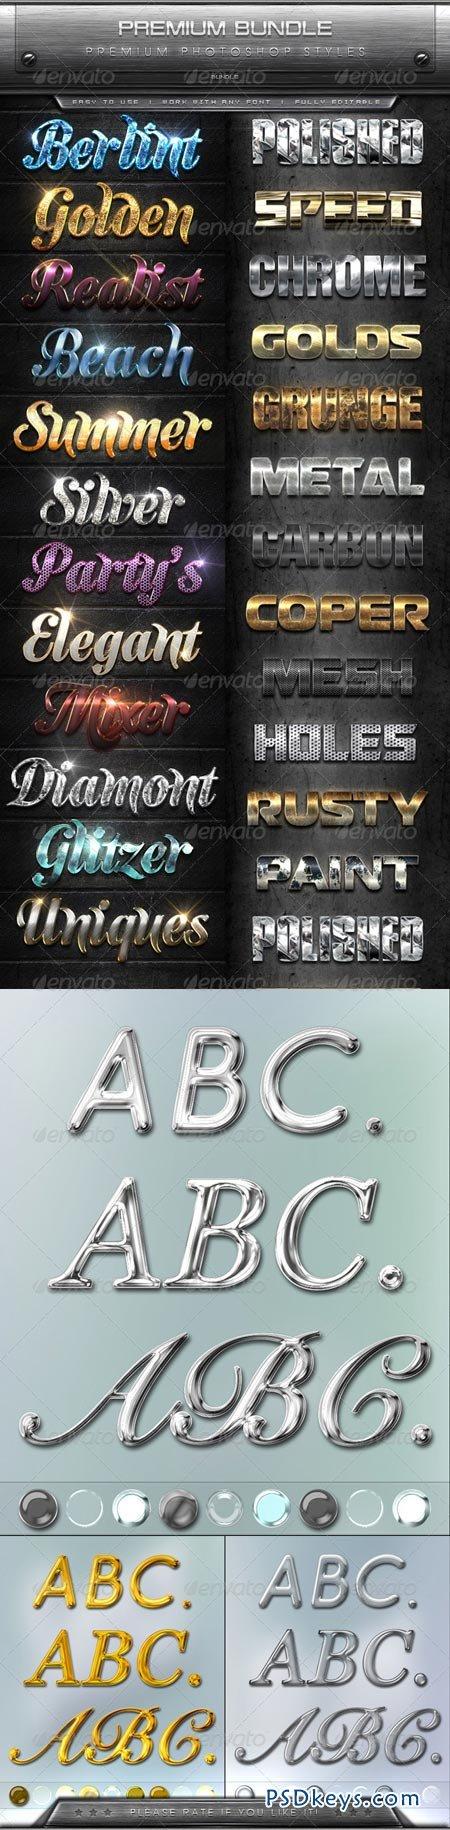 Premium Text Effects Styles Bundle 8660933